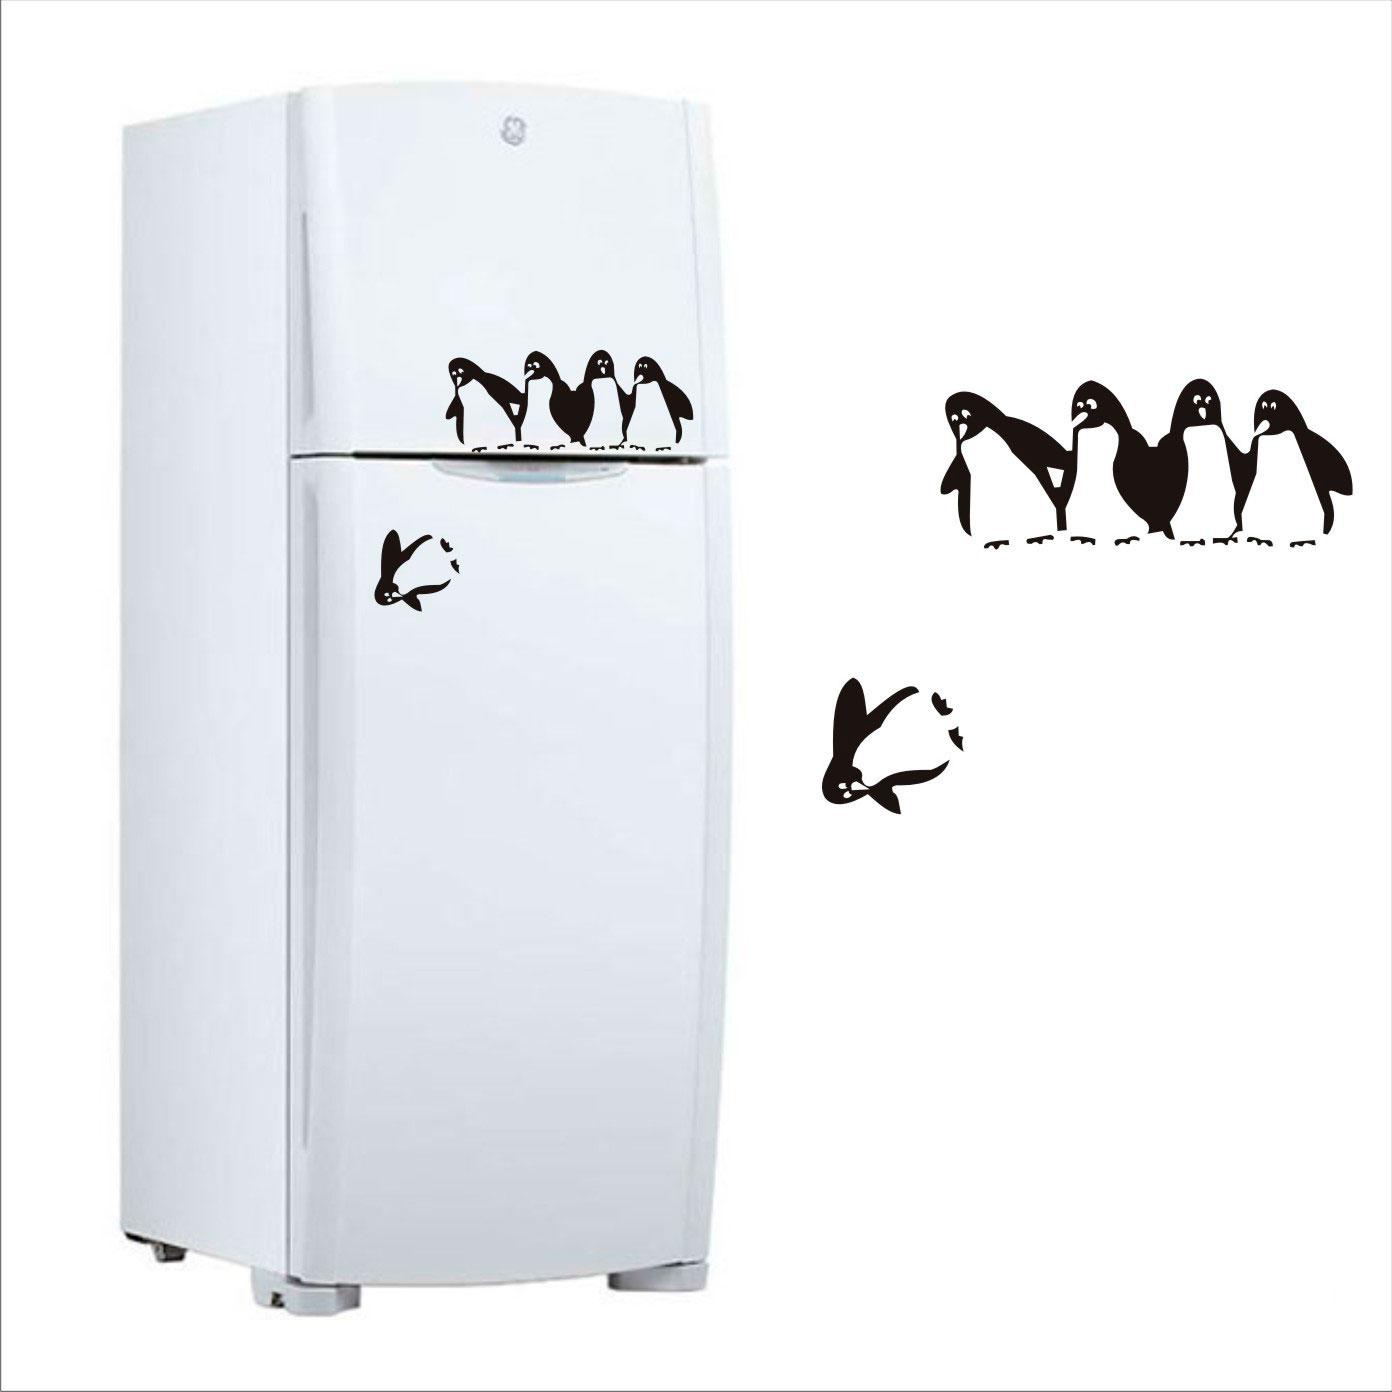 Adesivo de pinguins para geladeira